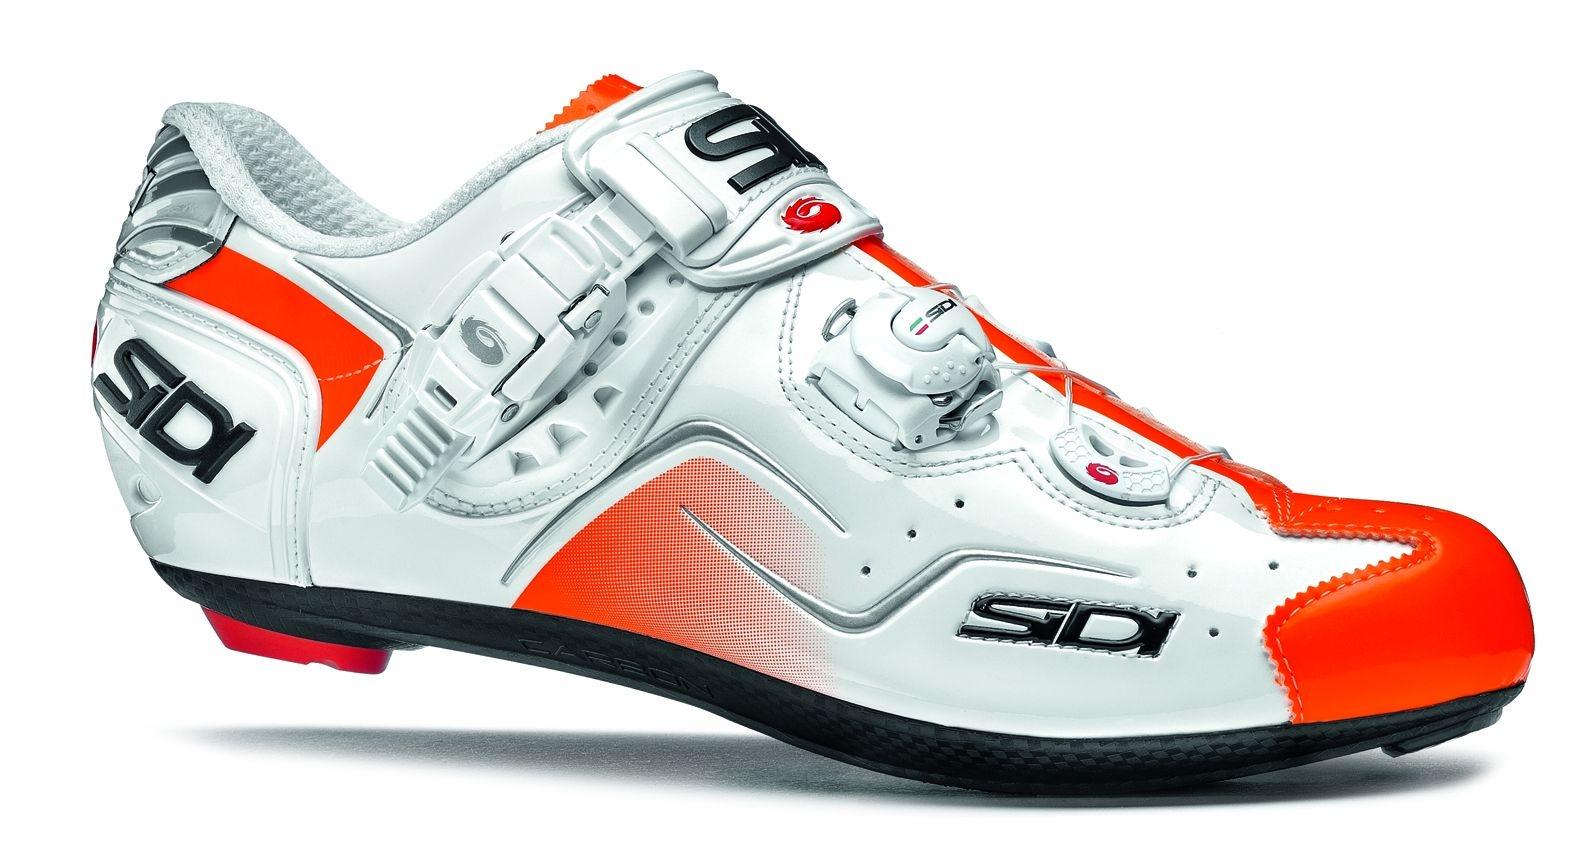 Chaussures Sidi KAOS Blanc/Orange verni - 42